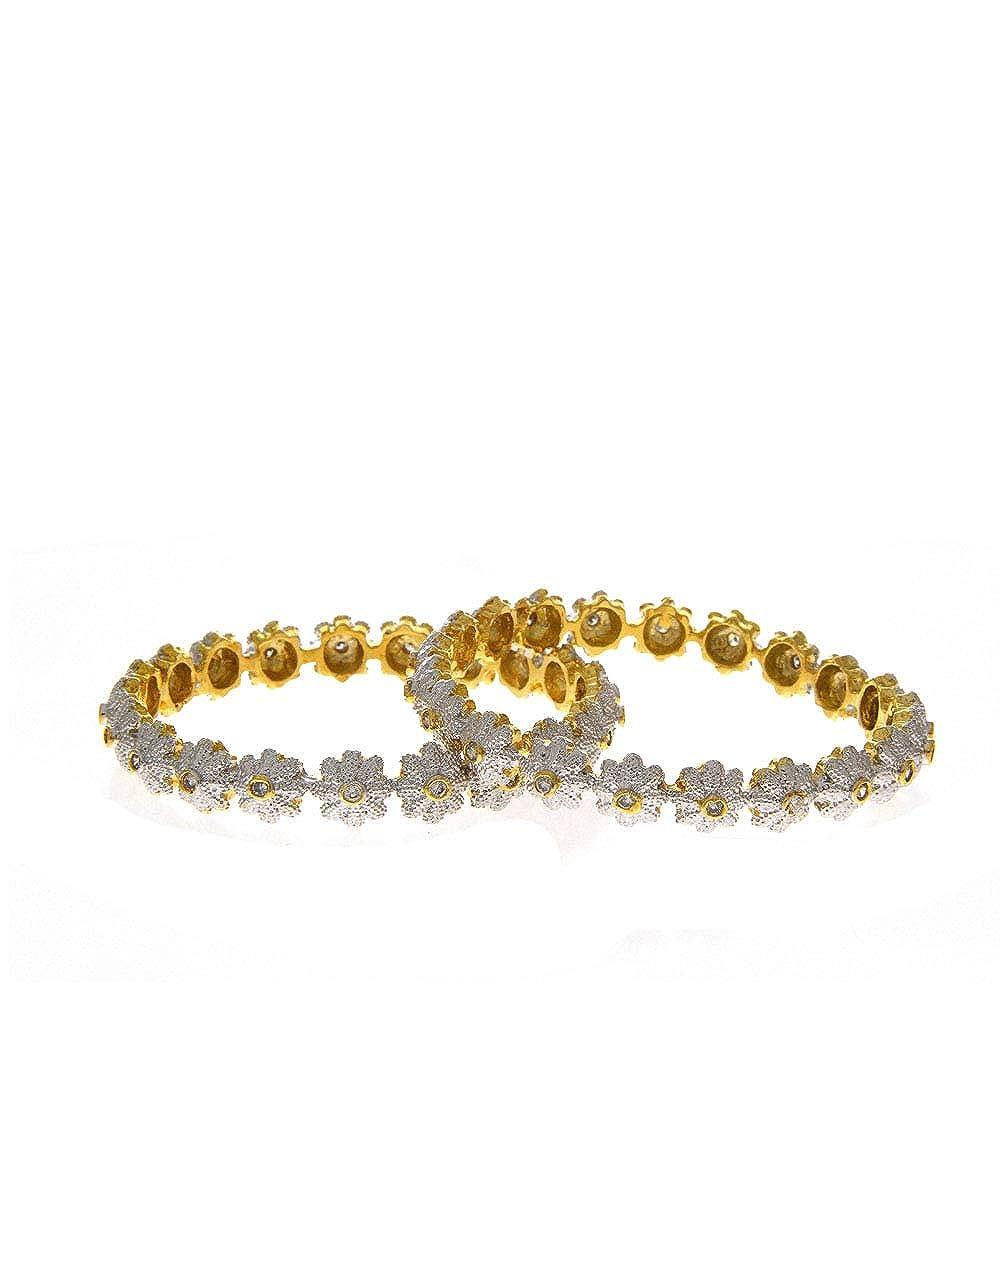 Anuradha Art Gold Finish Flower Desinge with American Daimond Bangle Set for Women//Gilrs